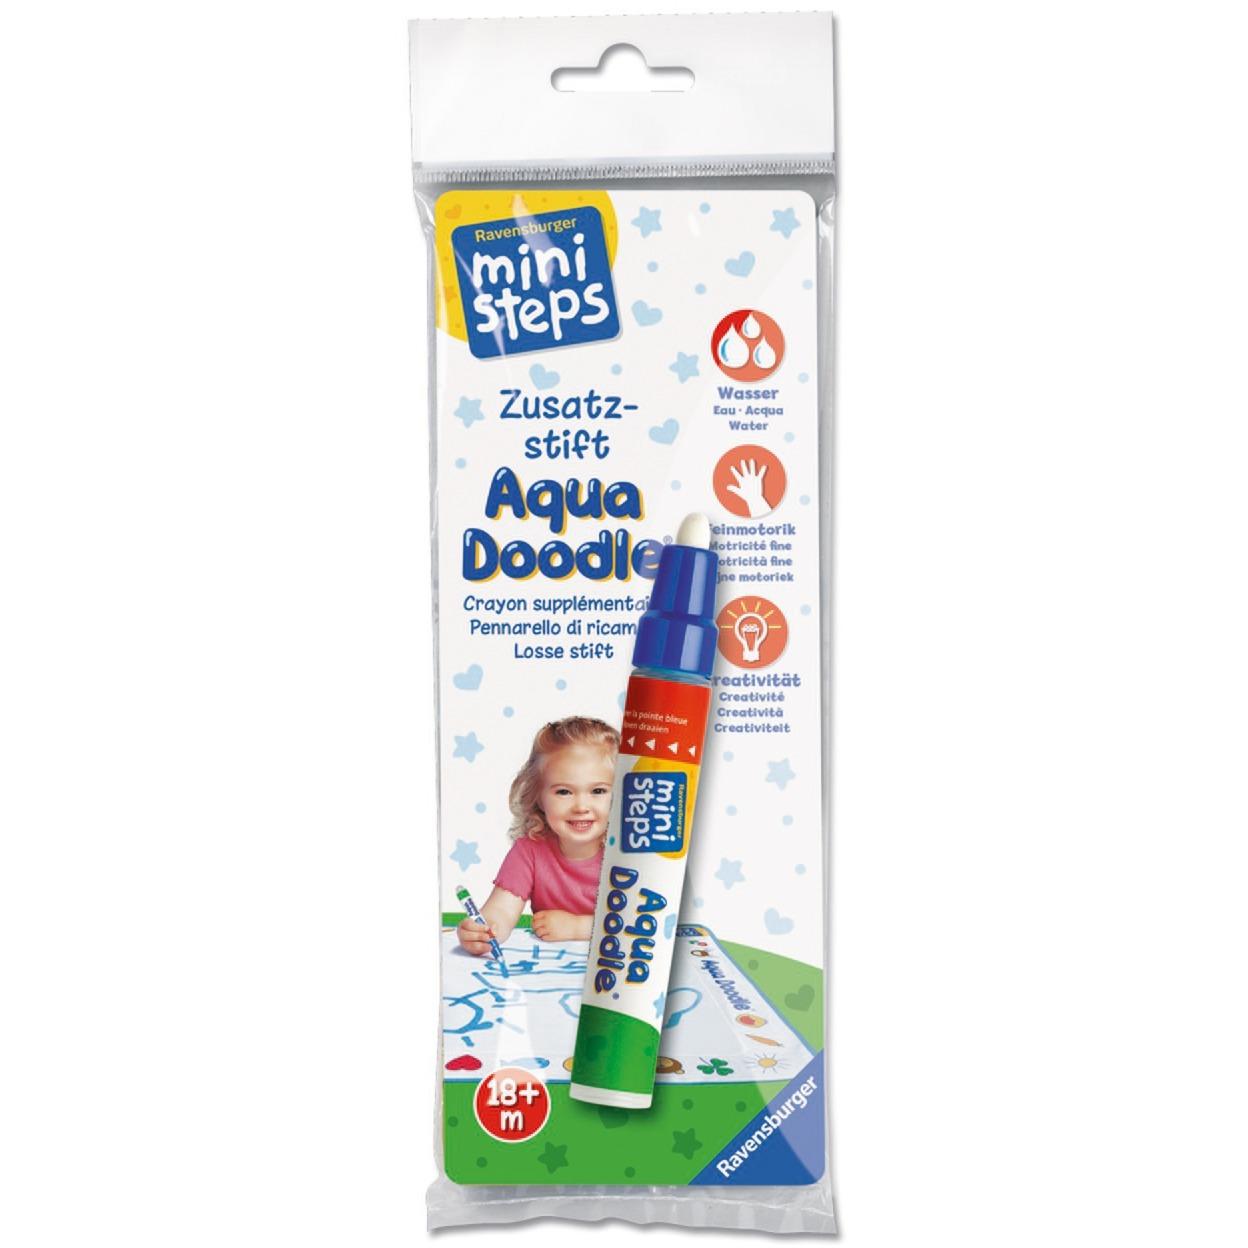 aqua-doodle-zusatzstift-pen